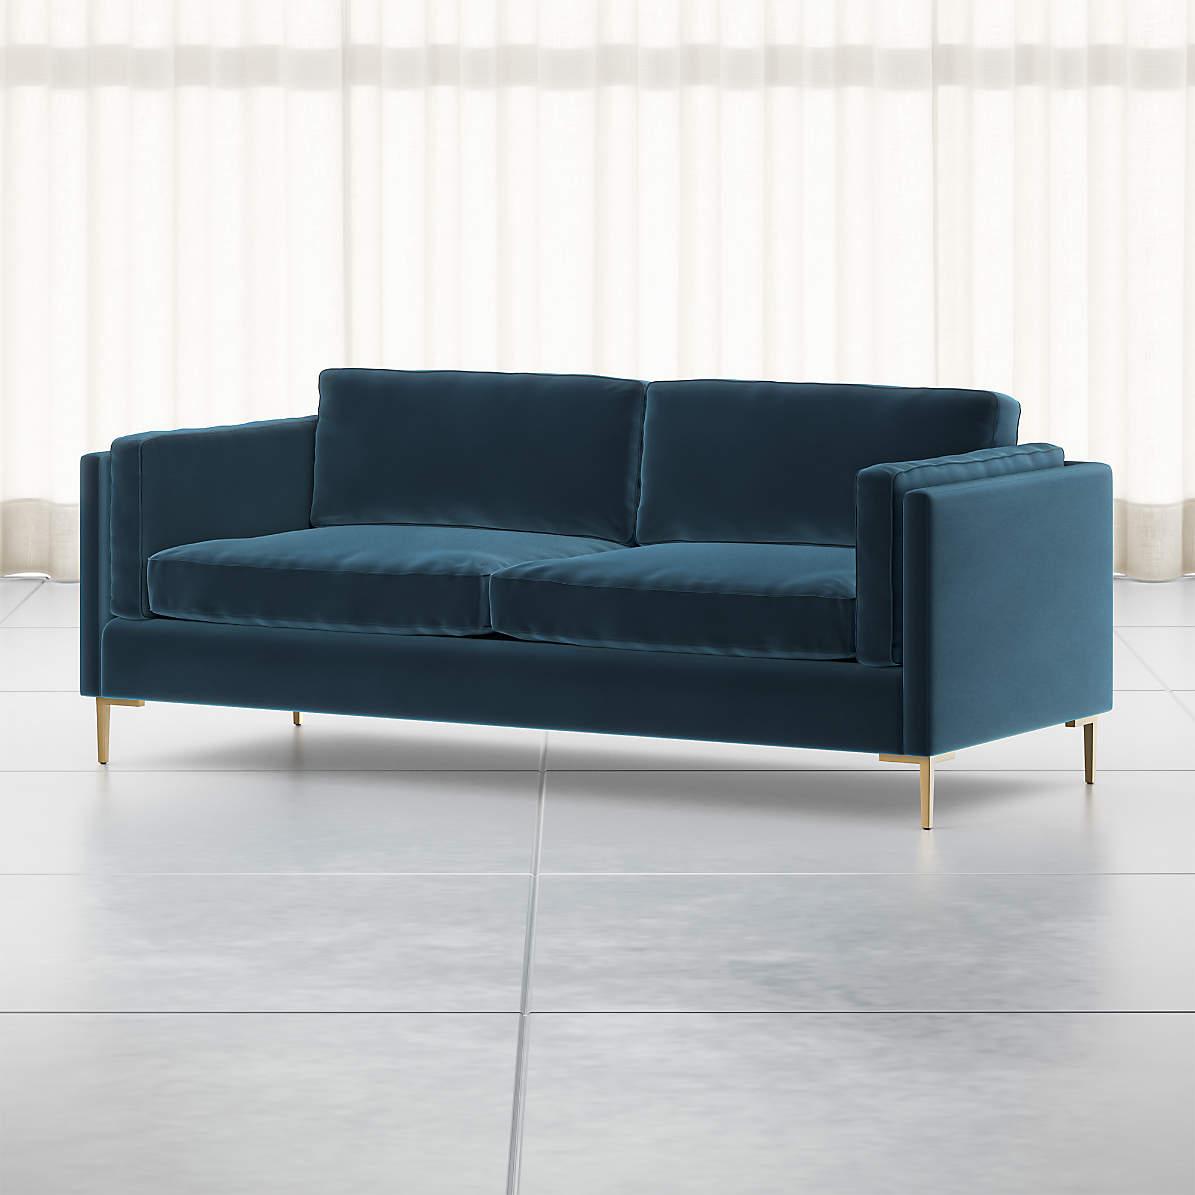 Rosalina 84 Blue Velvet Sofa Reviews Crate And Barrel